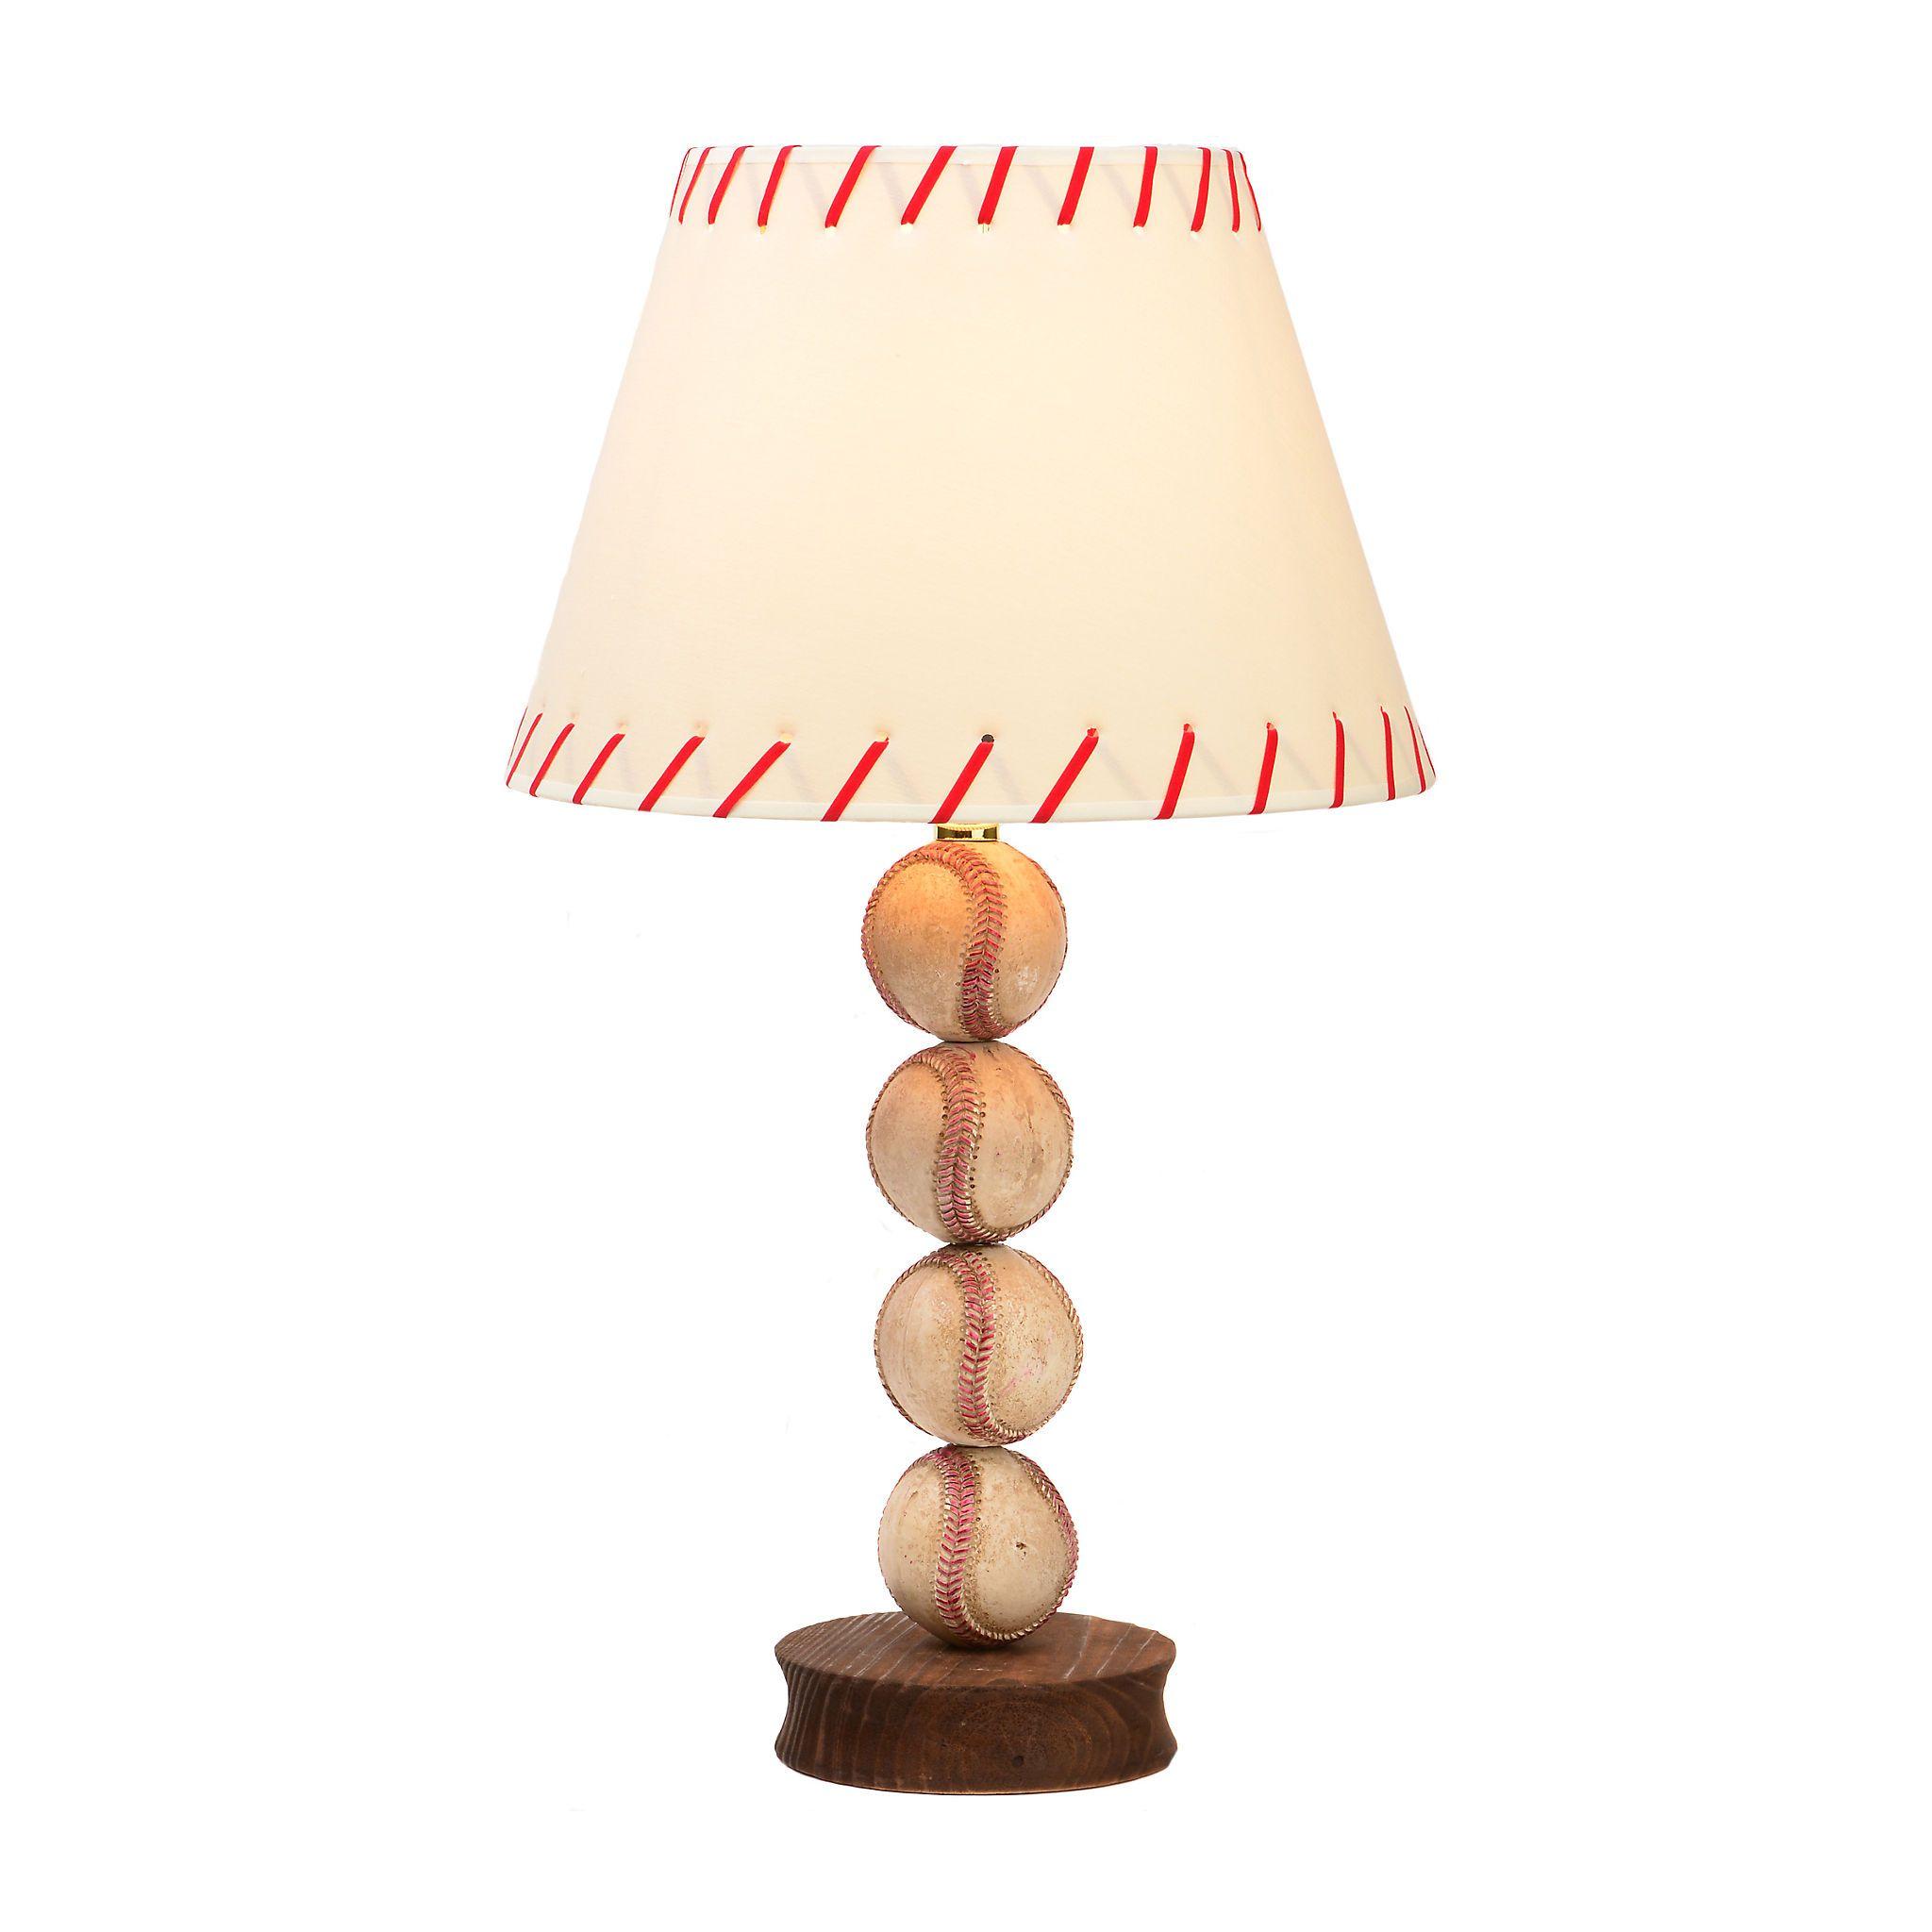 Stacked baseball table lamp baseball table and room stacked baseball table lamp geotapseo Image collections